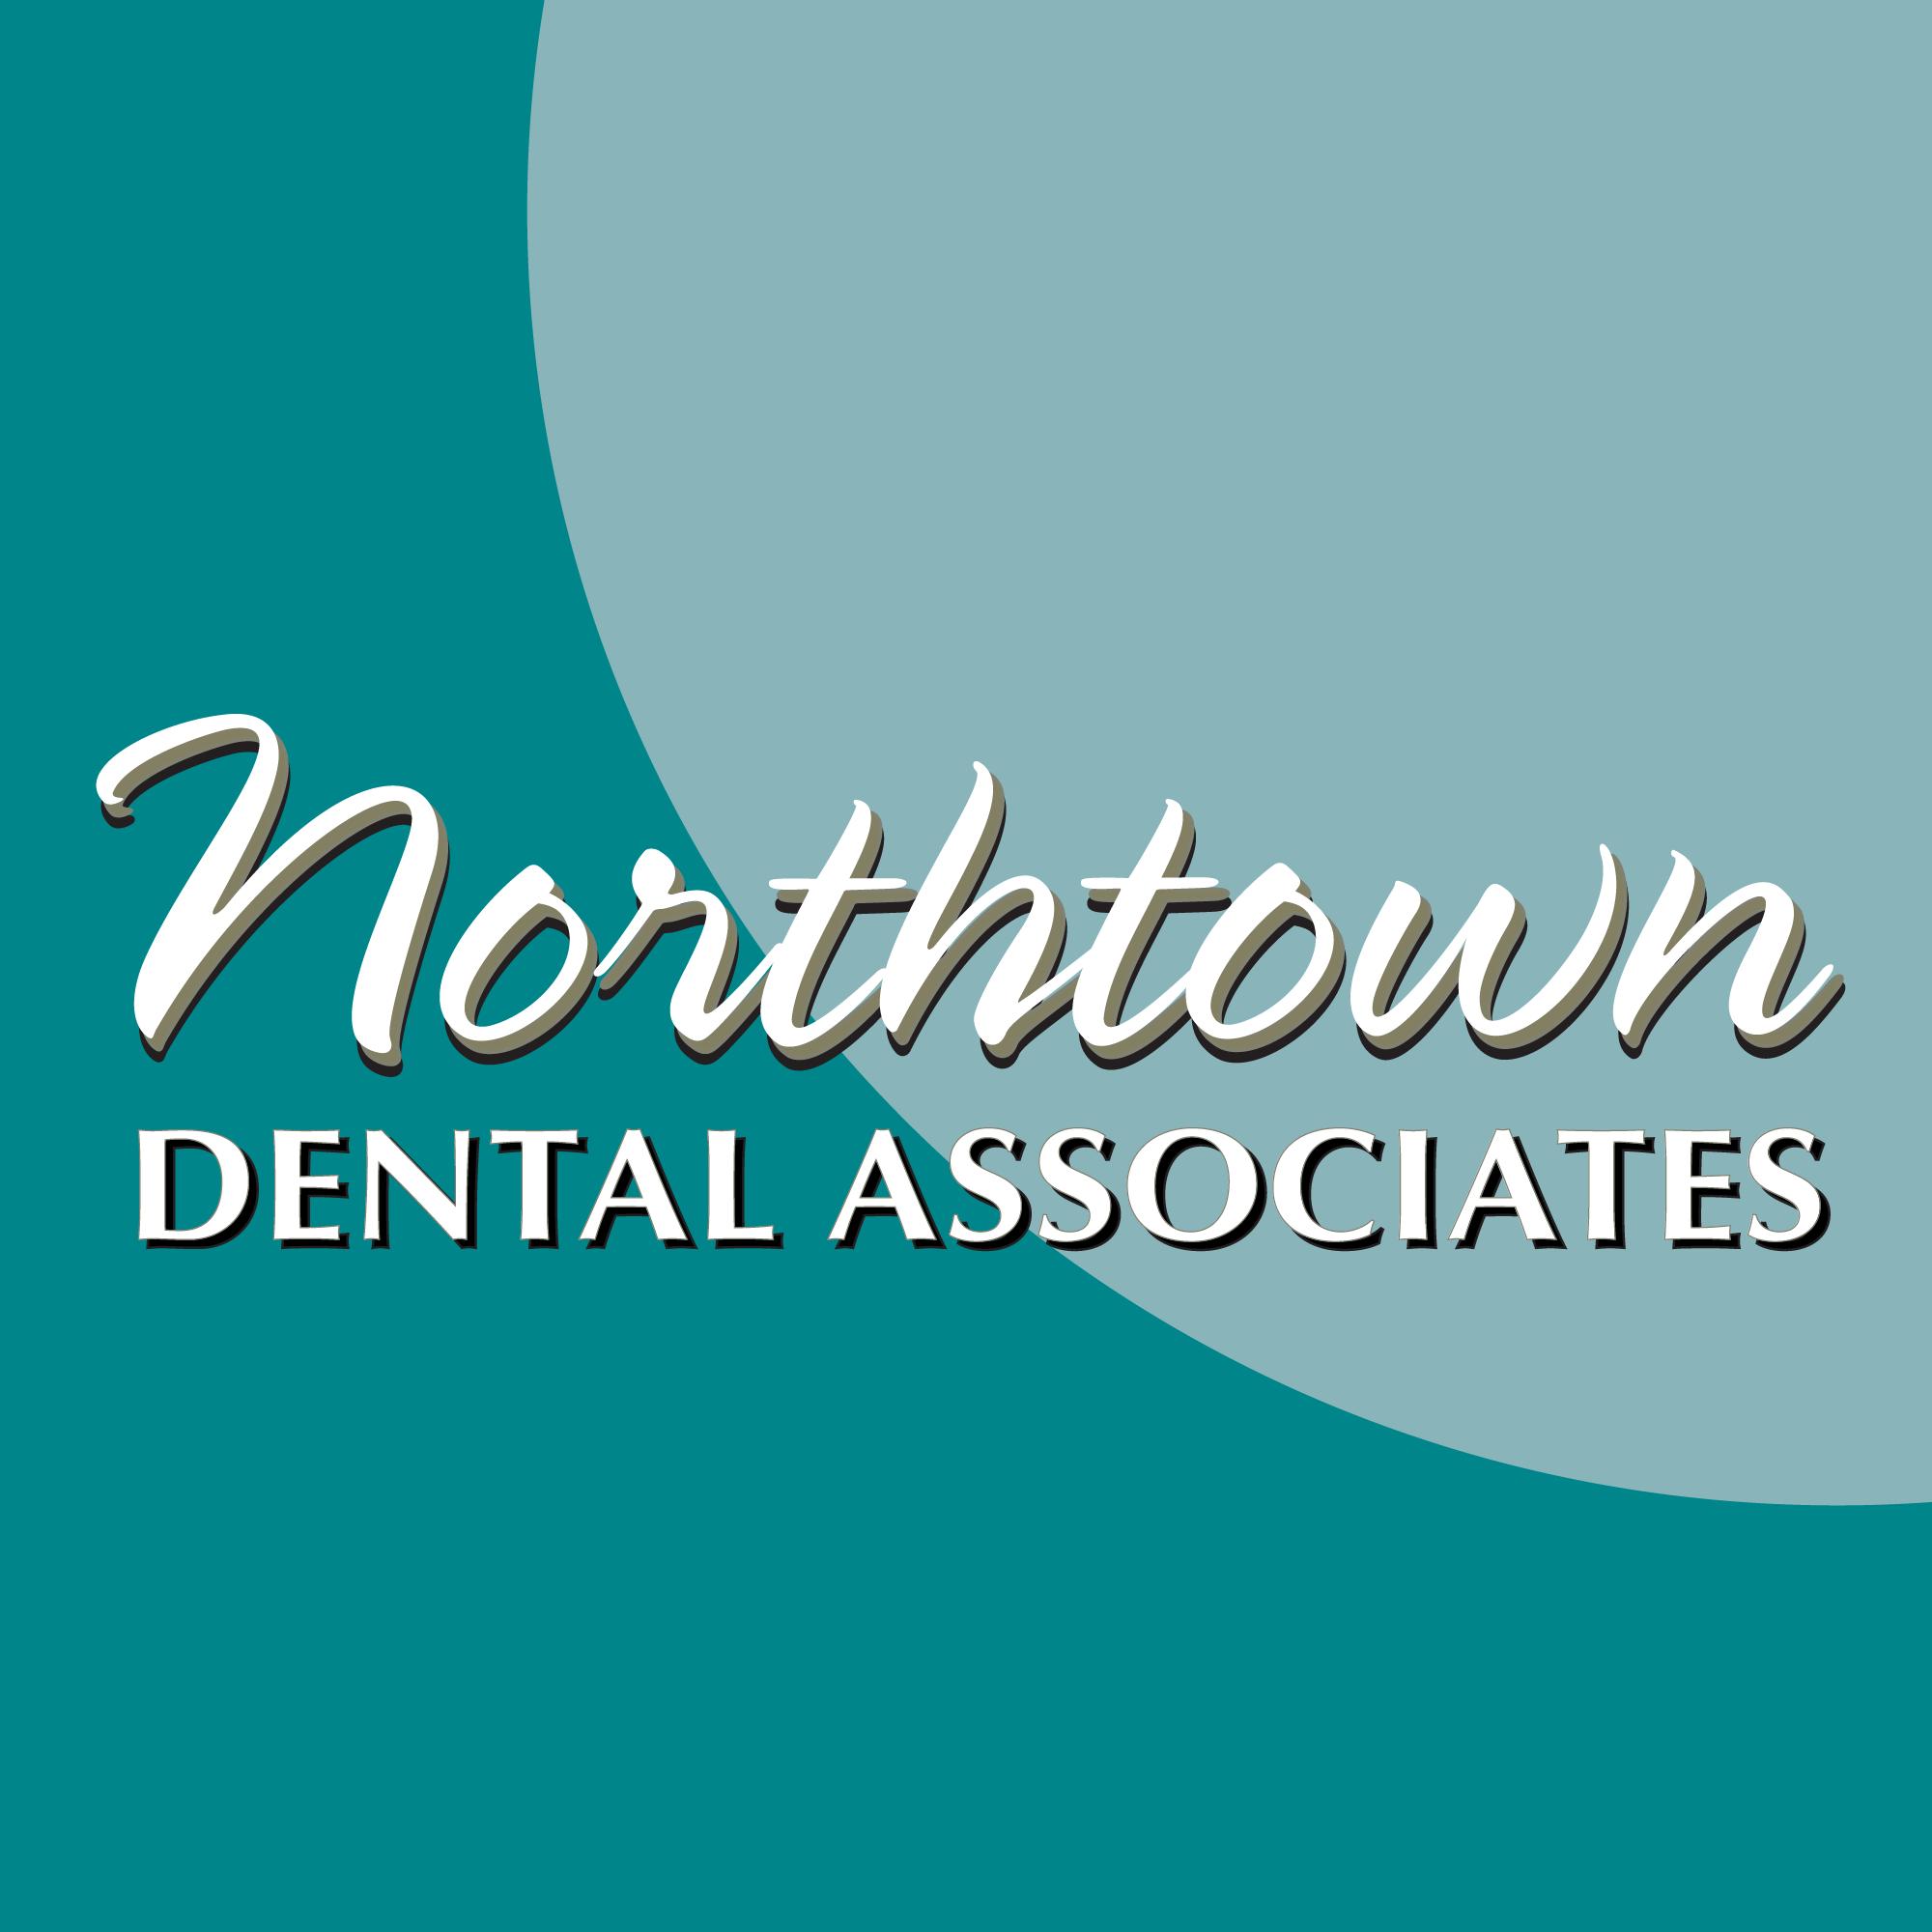 Northtown Dental Associates - Video 1